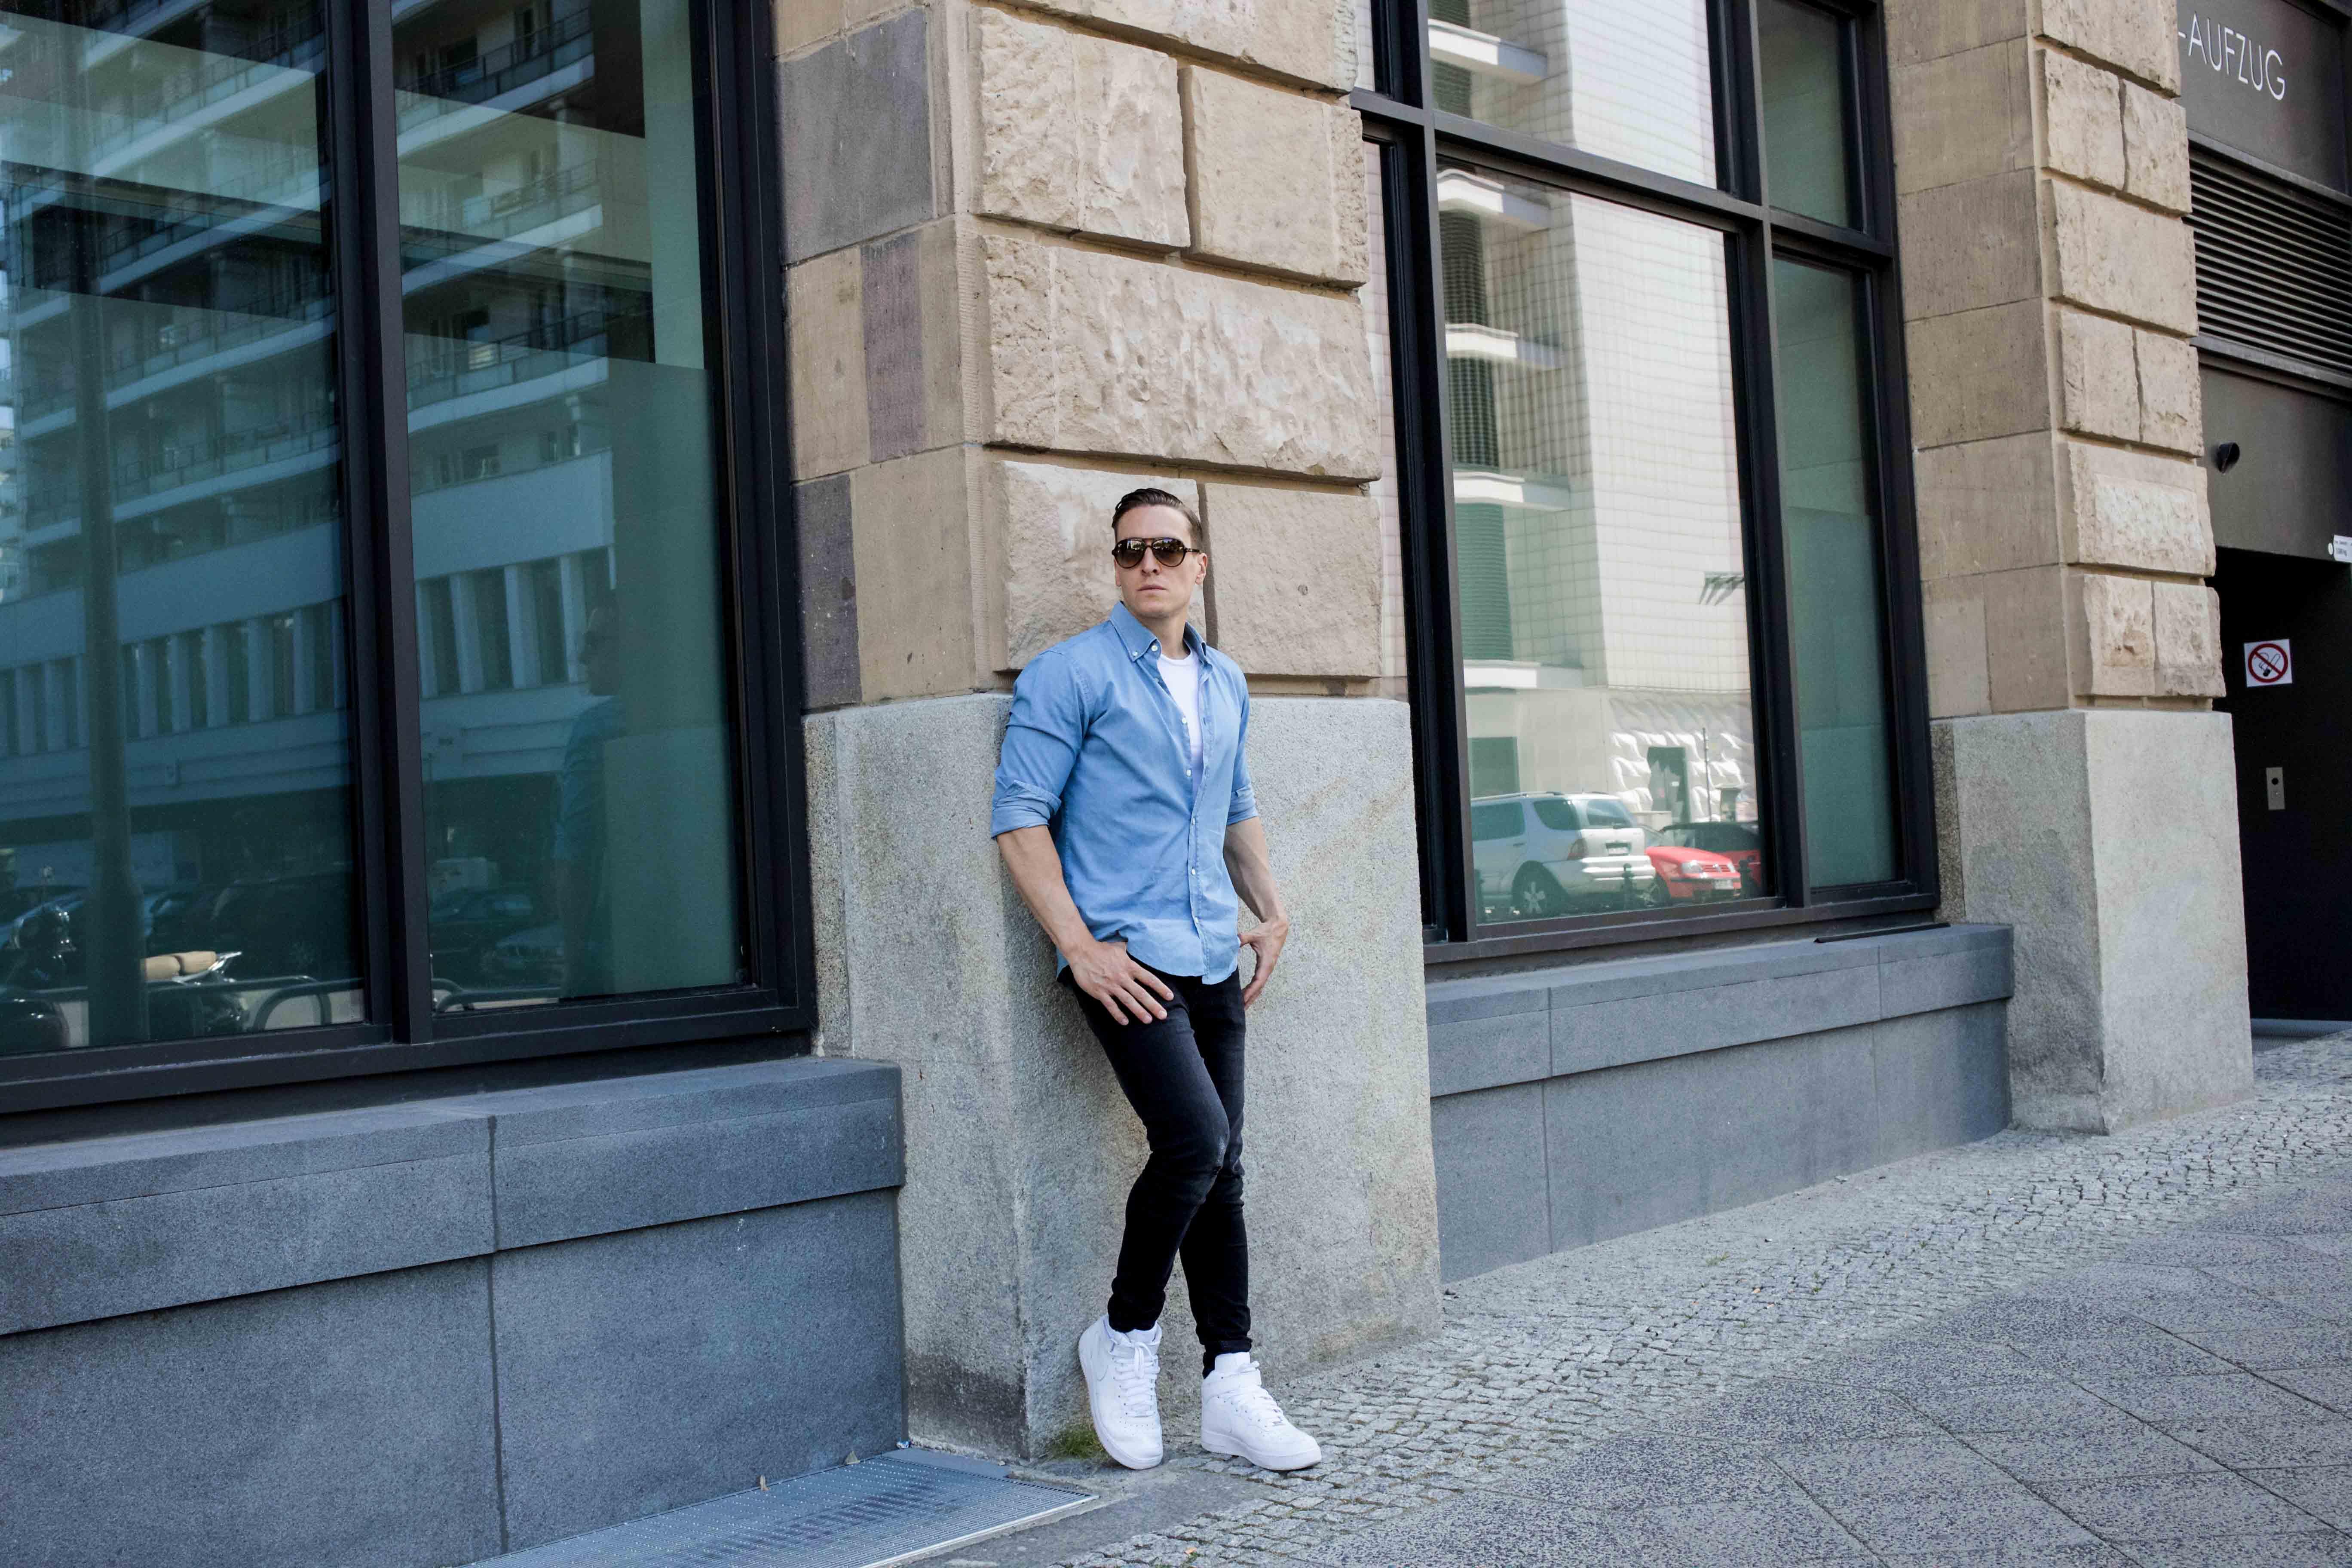 hellblaues-freizeitshirt-rayban-cats-destroyed-skinny-jeans-männerblog-menfashion-fashionblog_7843